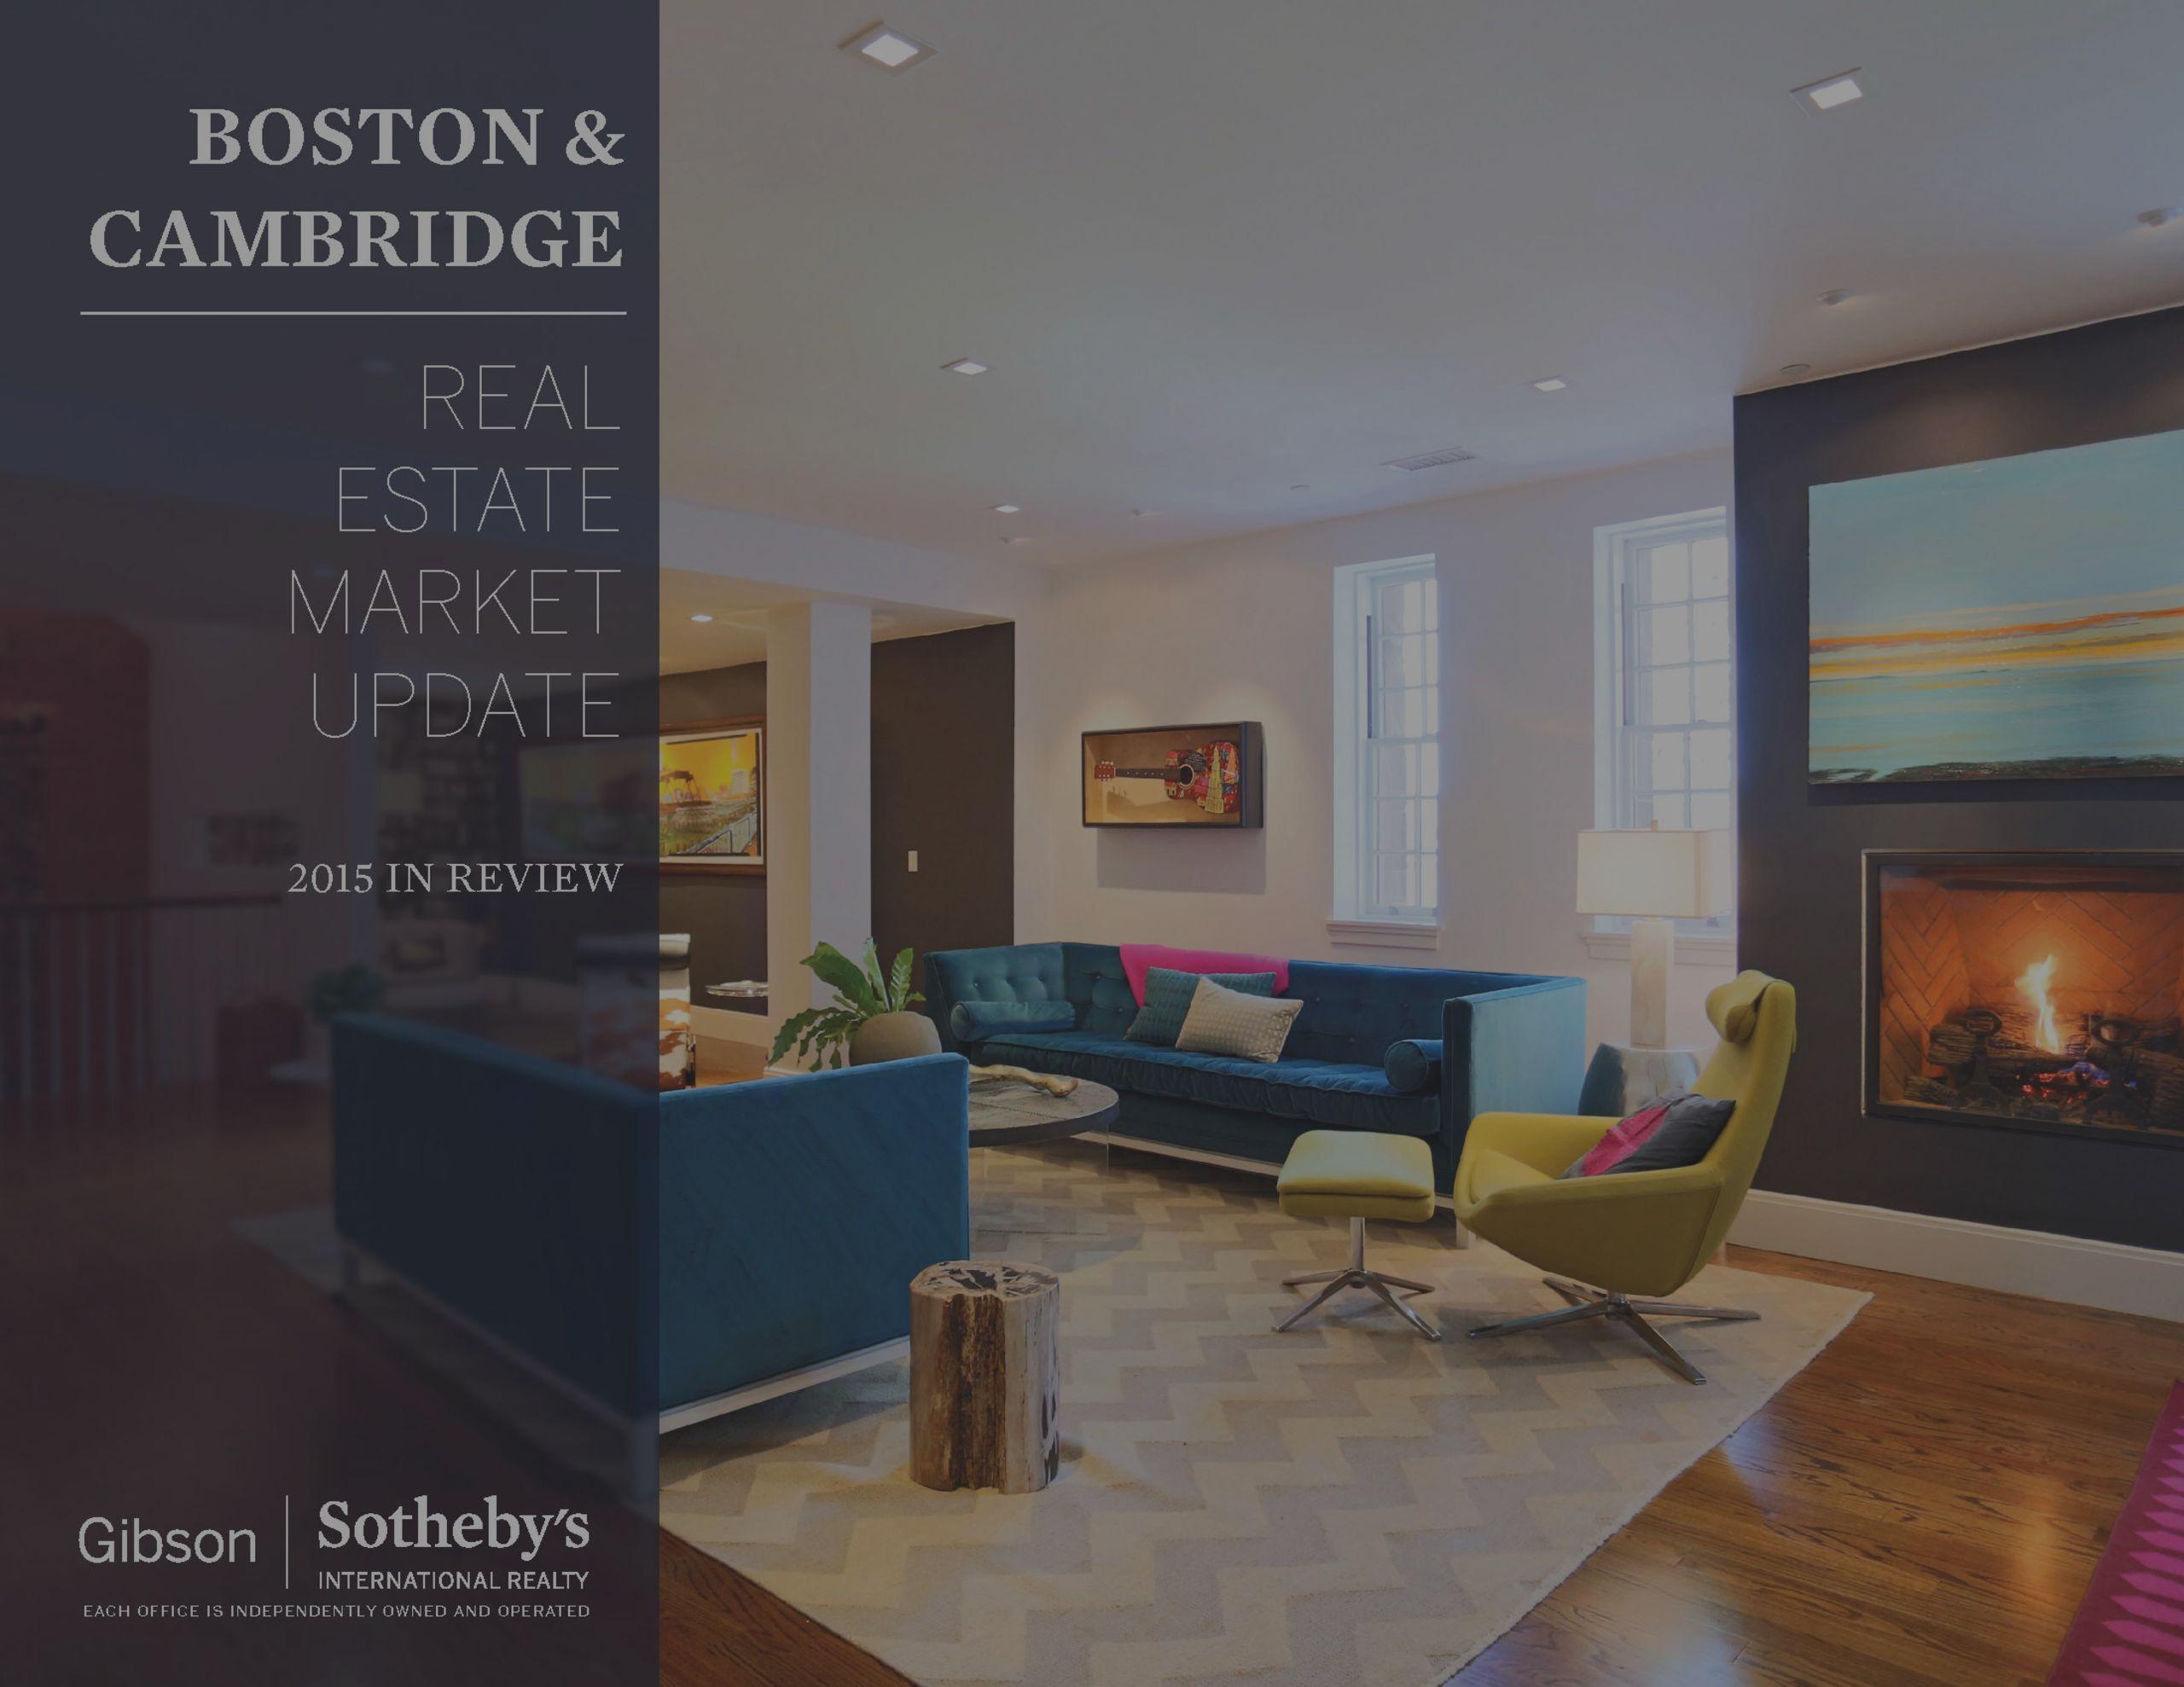 Real Estate Market Update: Boston & Cambridge – 2015 in Review